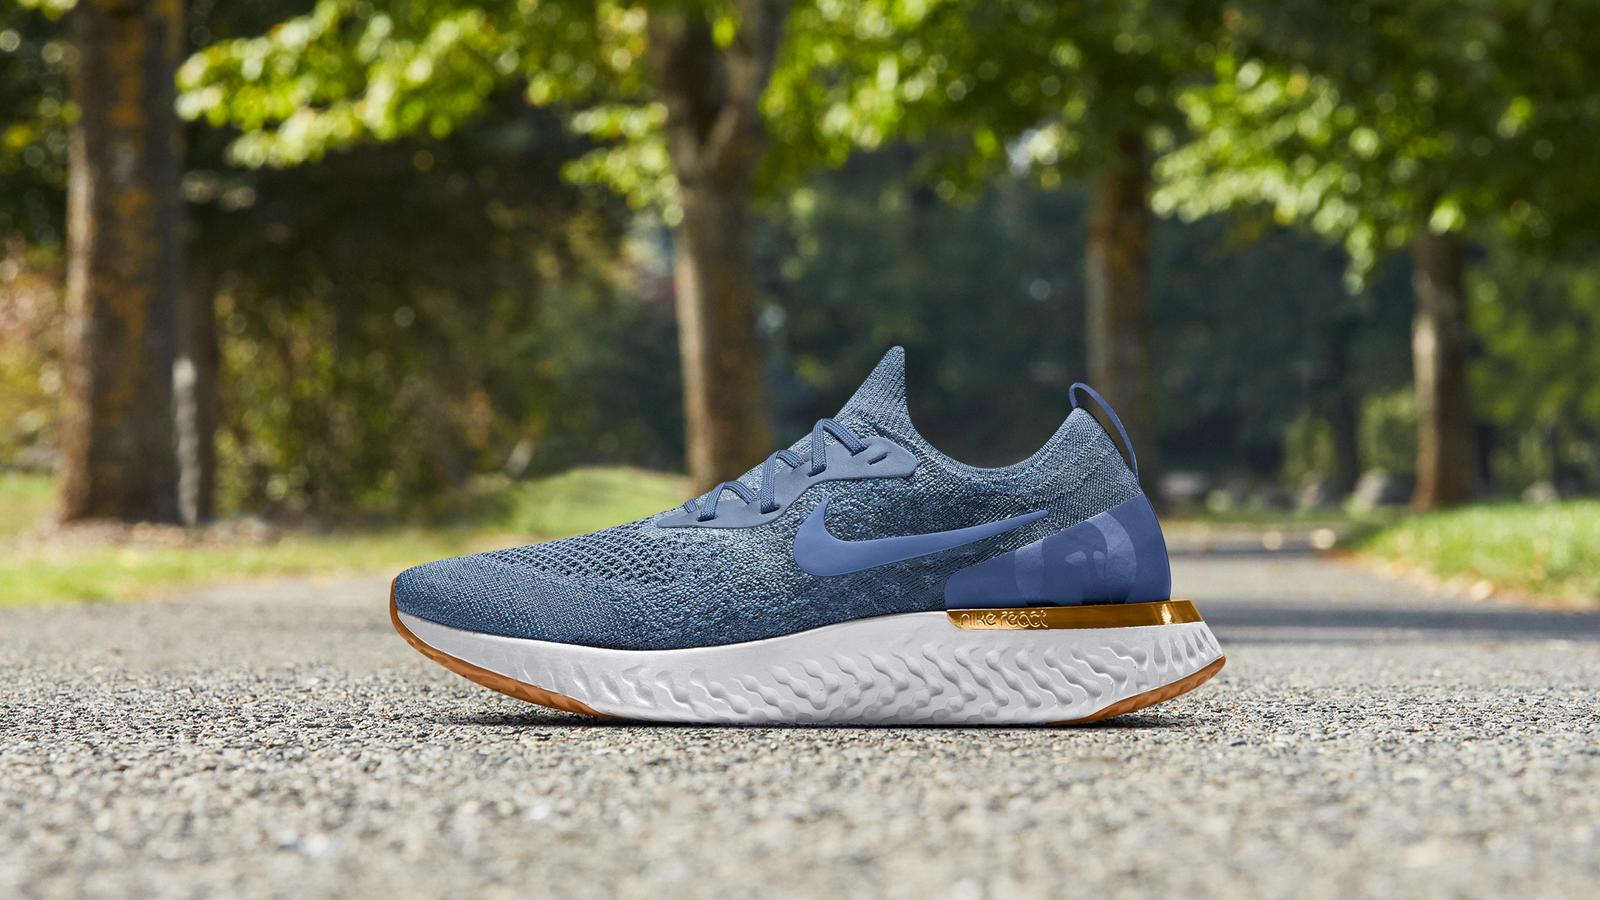 8225baac26653 Nike Epic React Flyknit iD - Nike News